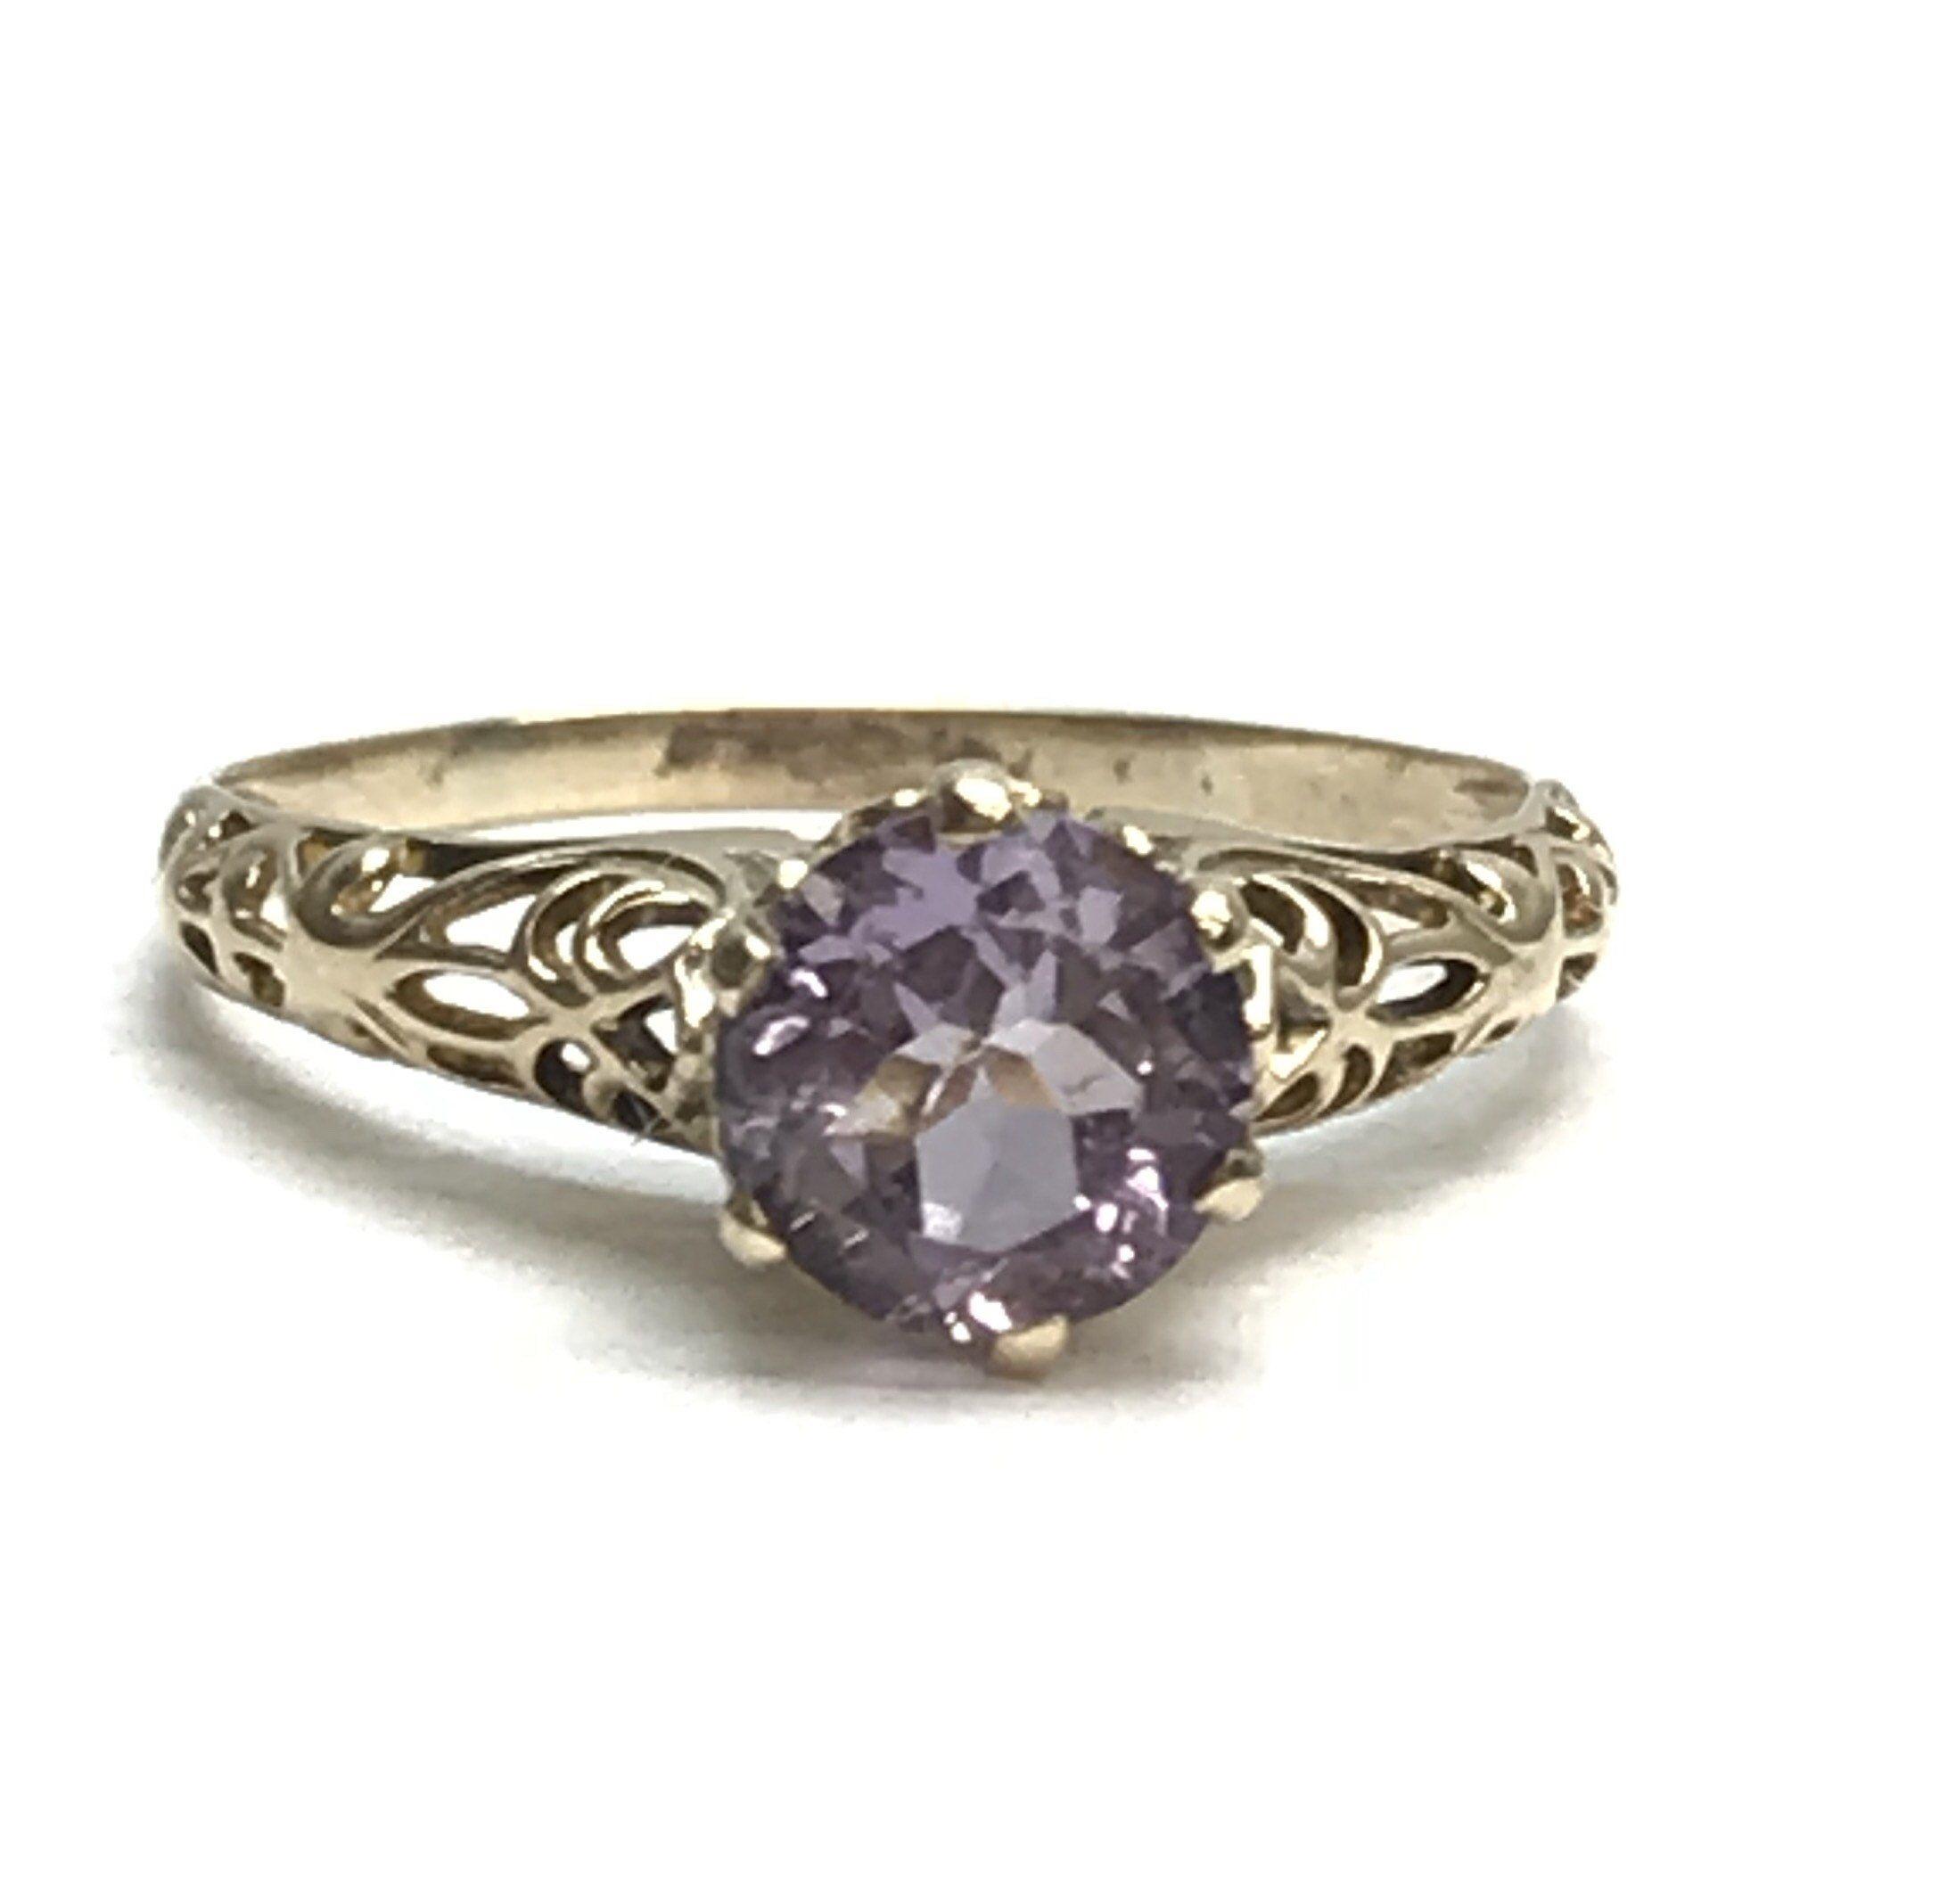 Vintage 10k Rose Gold Cathedral Set Coronet Set Six Prong Amethyst Solitaire Filigree Ring By Treasuredplum On Etsy Edwardian Ring Lovely Ring Filigree Ring